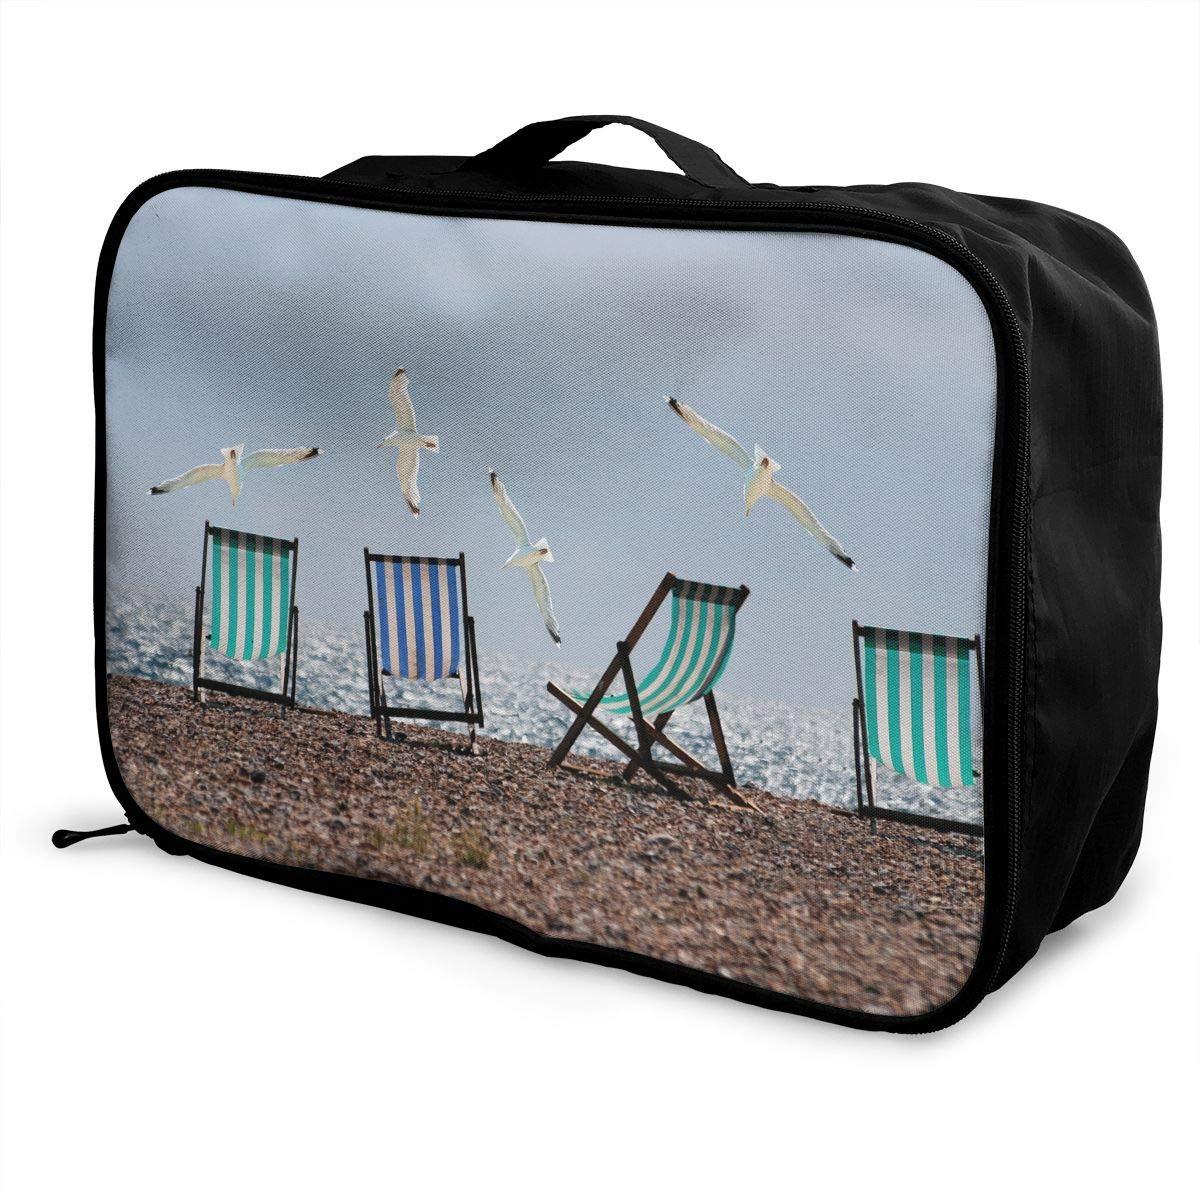 ADGAI Flying Seagull Canvas Travel Weekender Bag,Fashion Custom Lightweight Large Capacity Portable Luggage Bag,Suitcase Trolley Bag